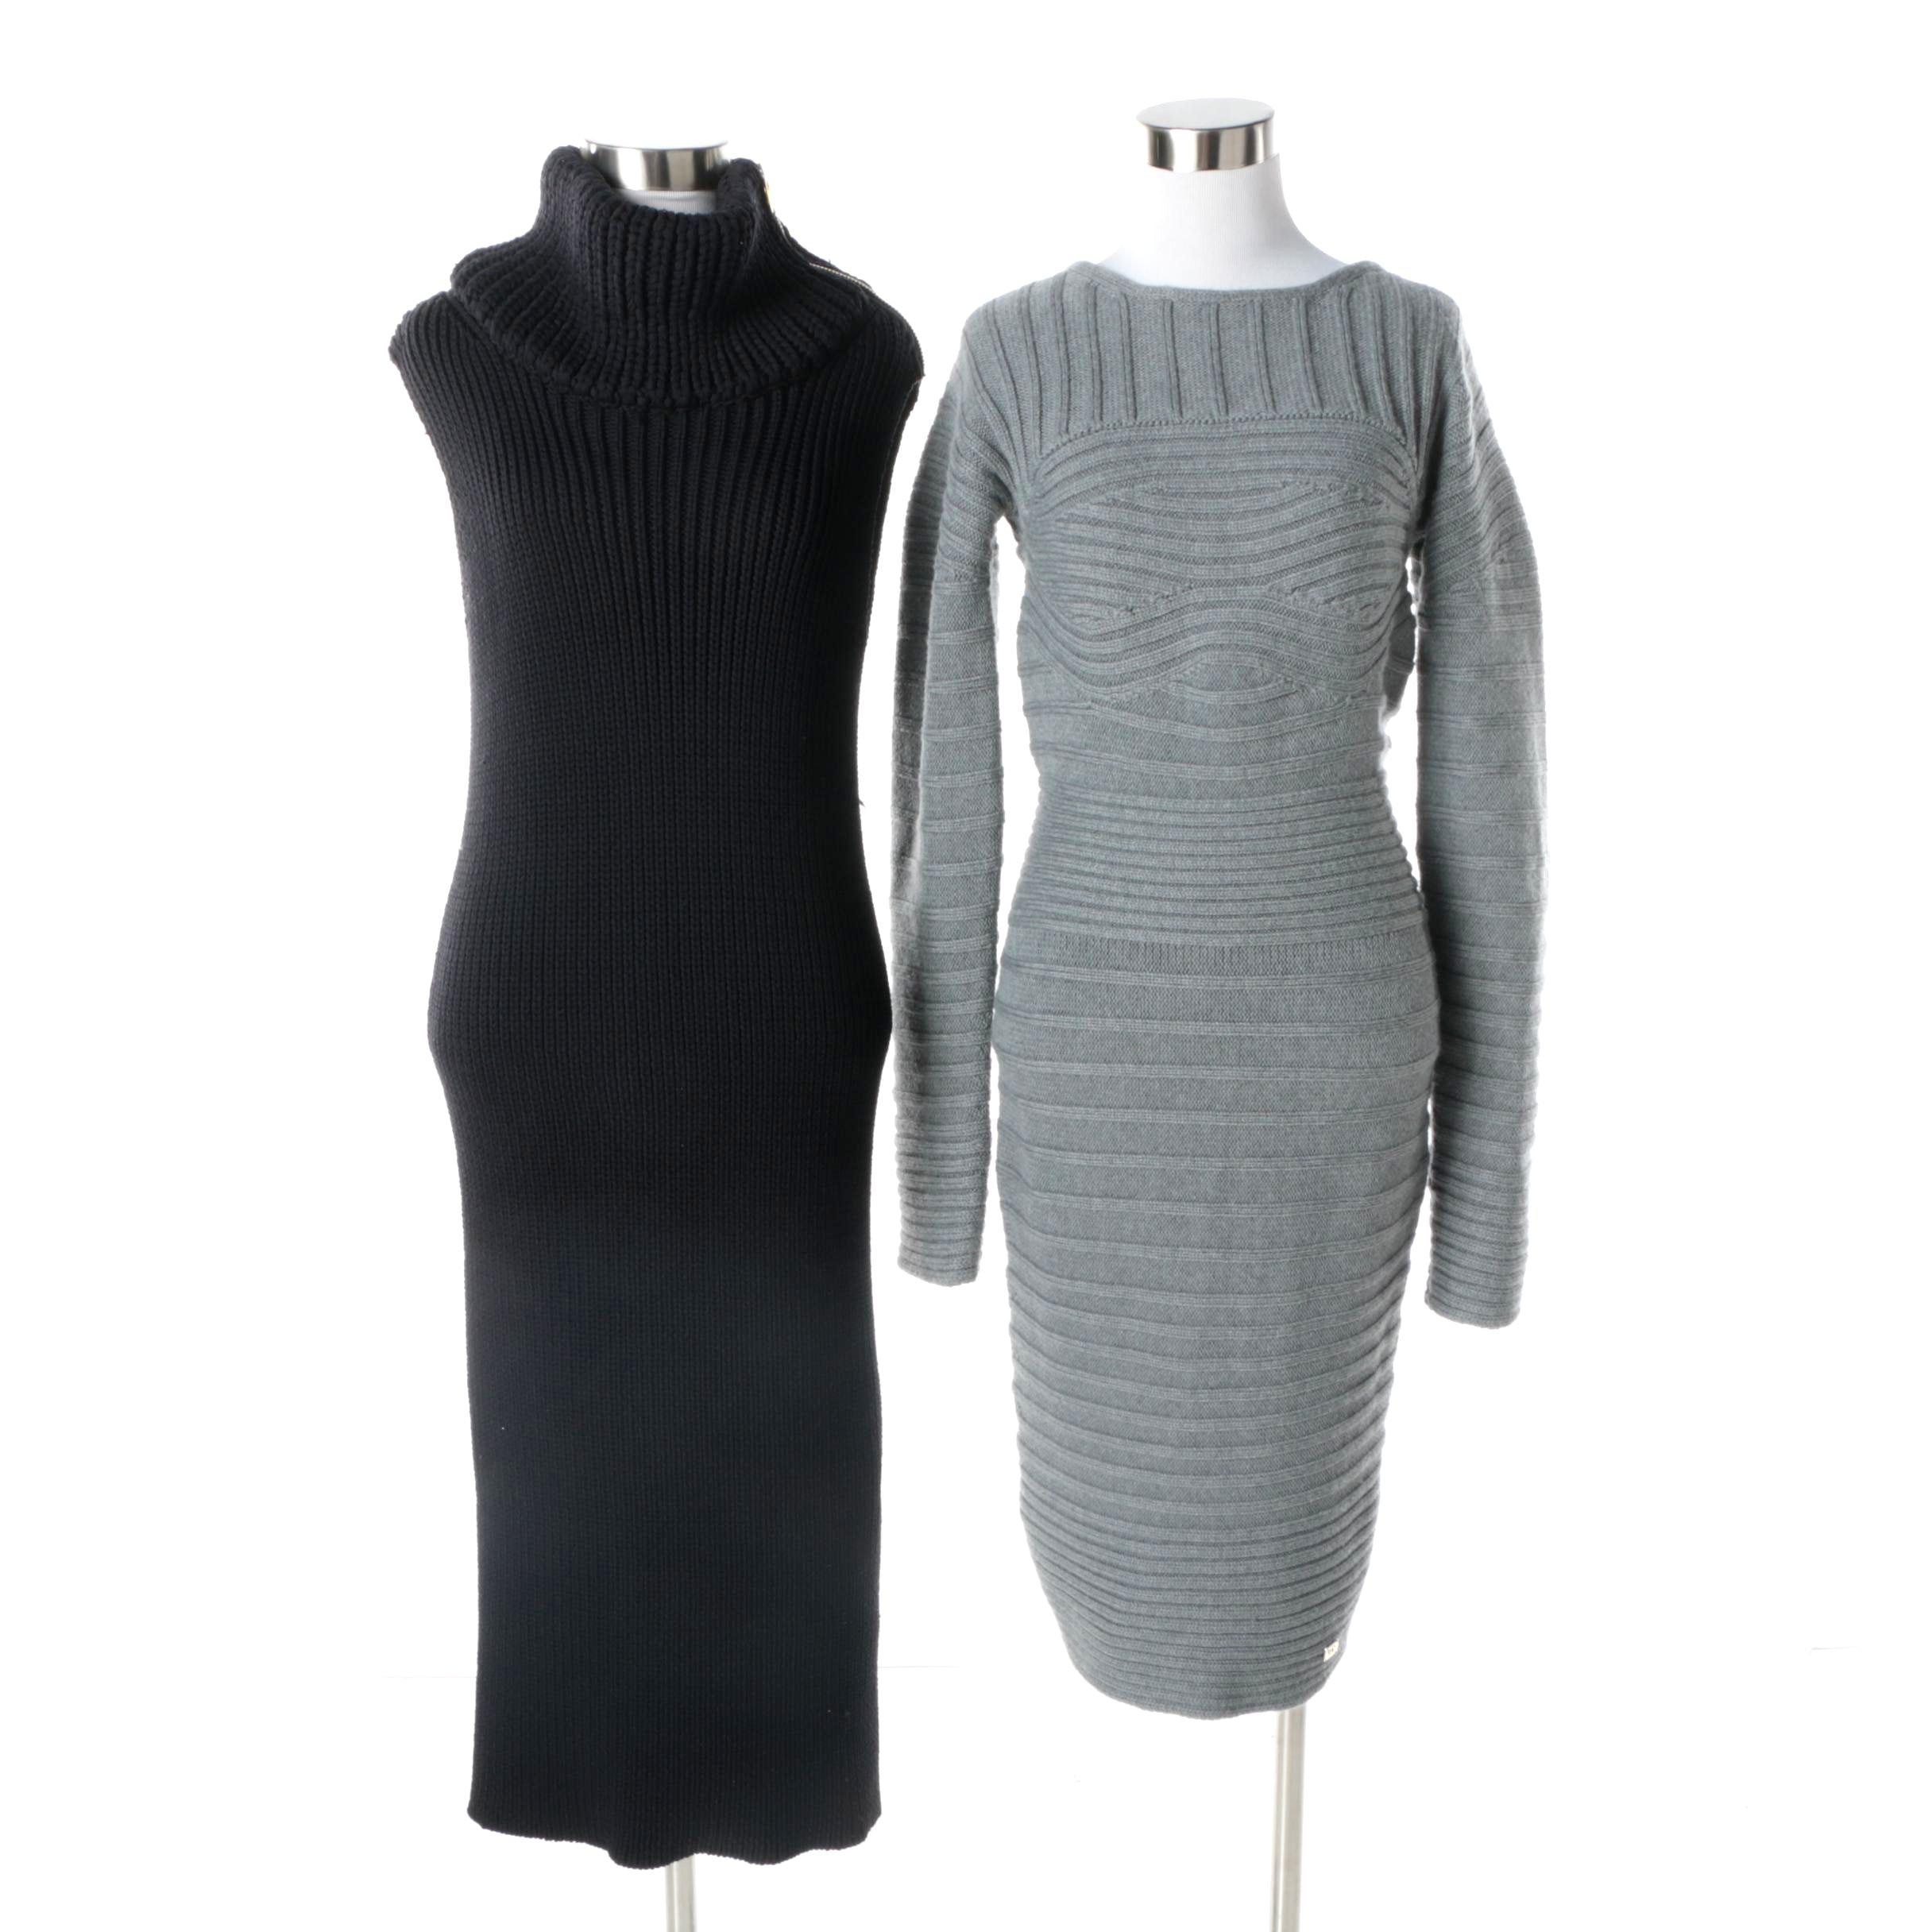 Women's Gianfranco Ferré and Rag & Bone Knit Dresses